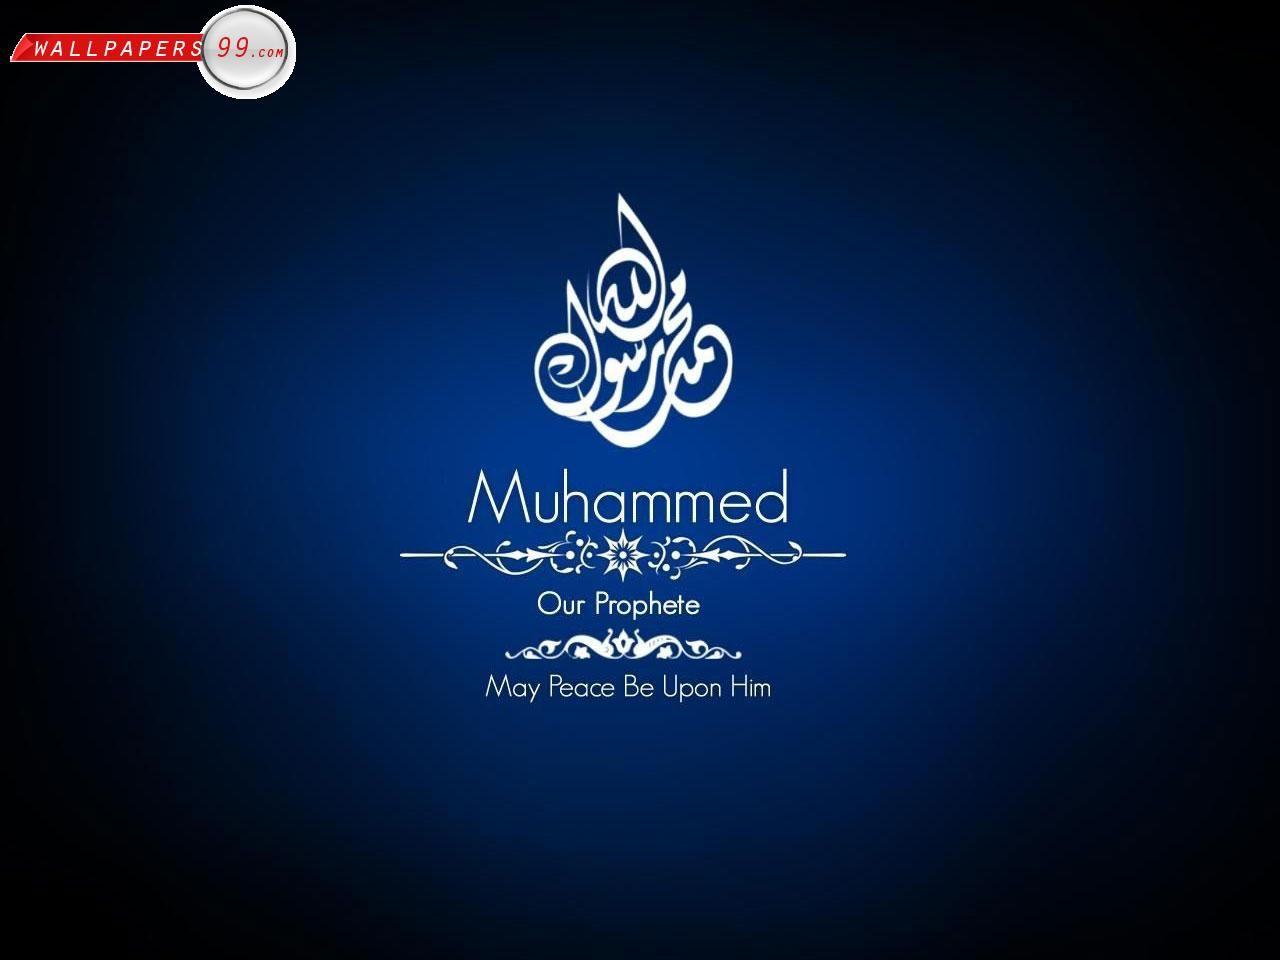 This Is The Symbol Of Our Last Prophet Hazrat Muhammadpbuh Whose